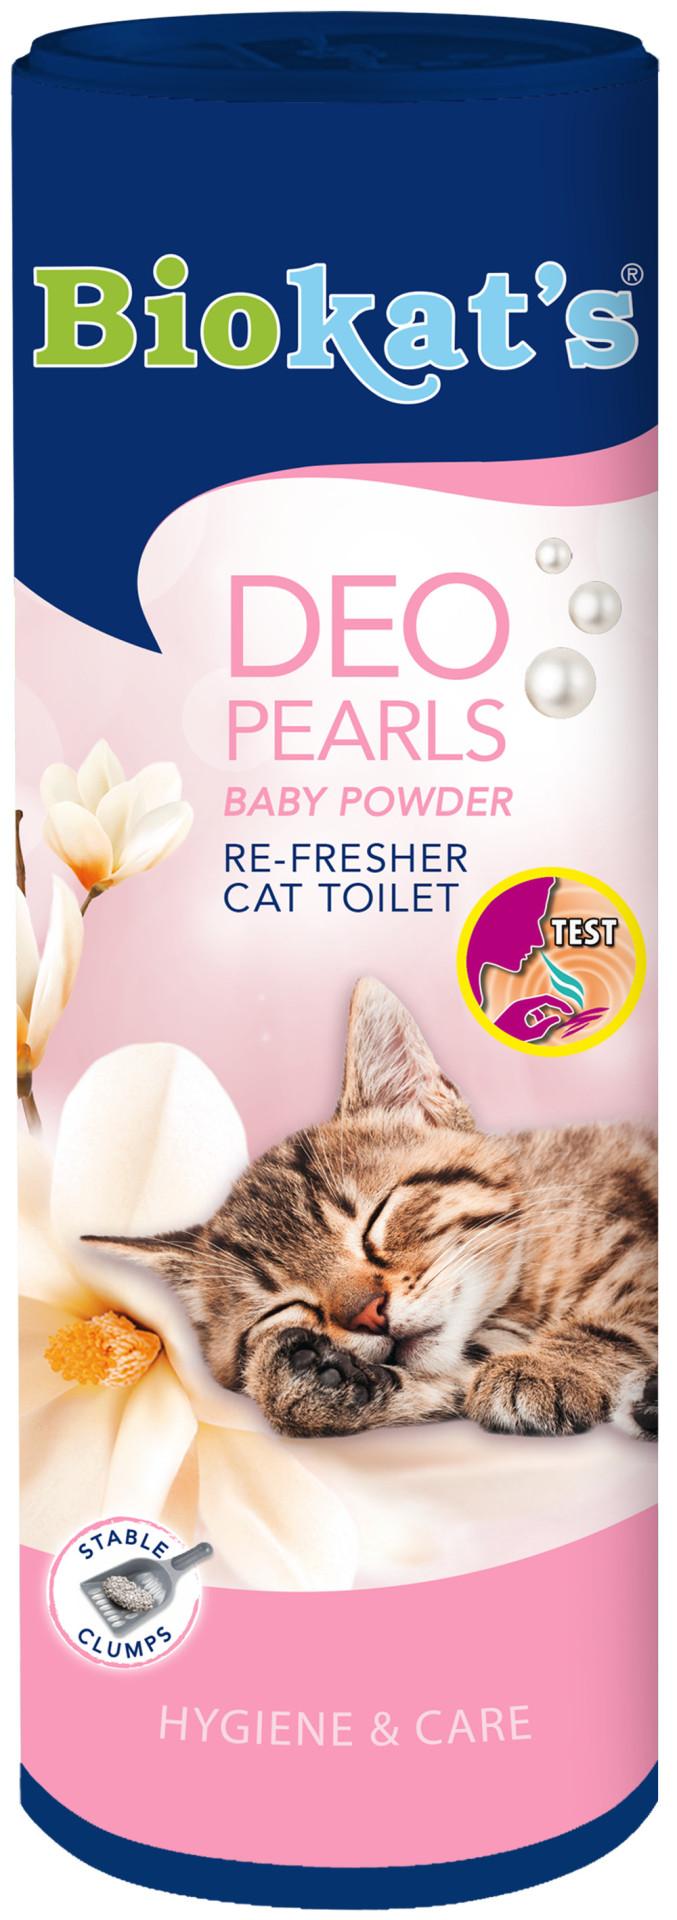 Biokat's Deo Pearls Baby Powder 700 gr